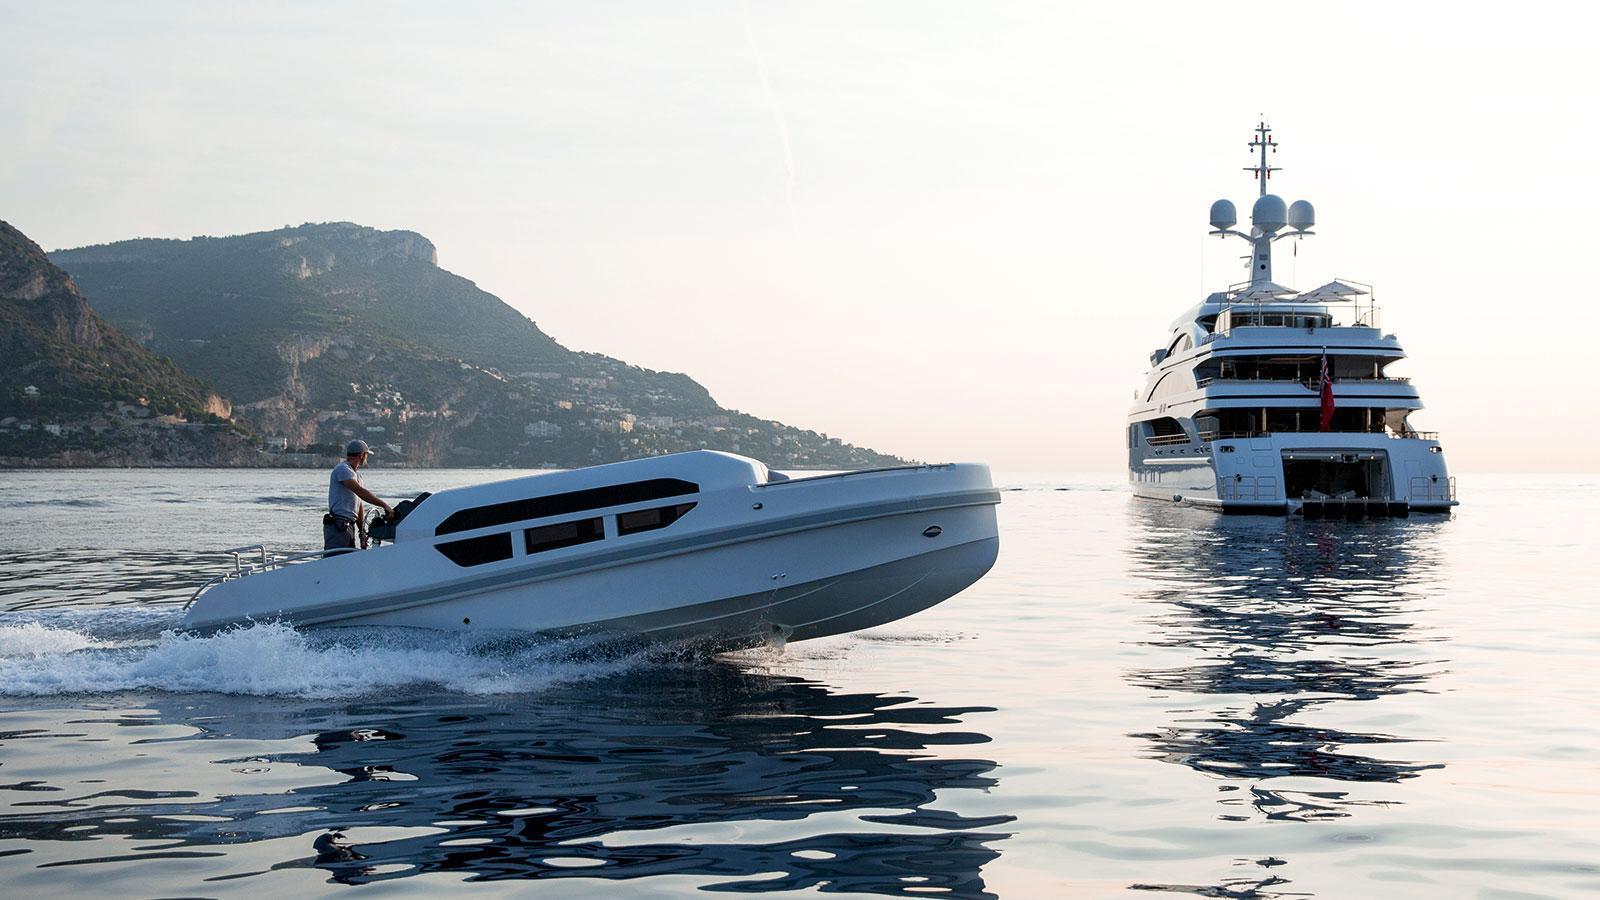 1111-motor-yacht-benetti-2015-63m-stern-tender